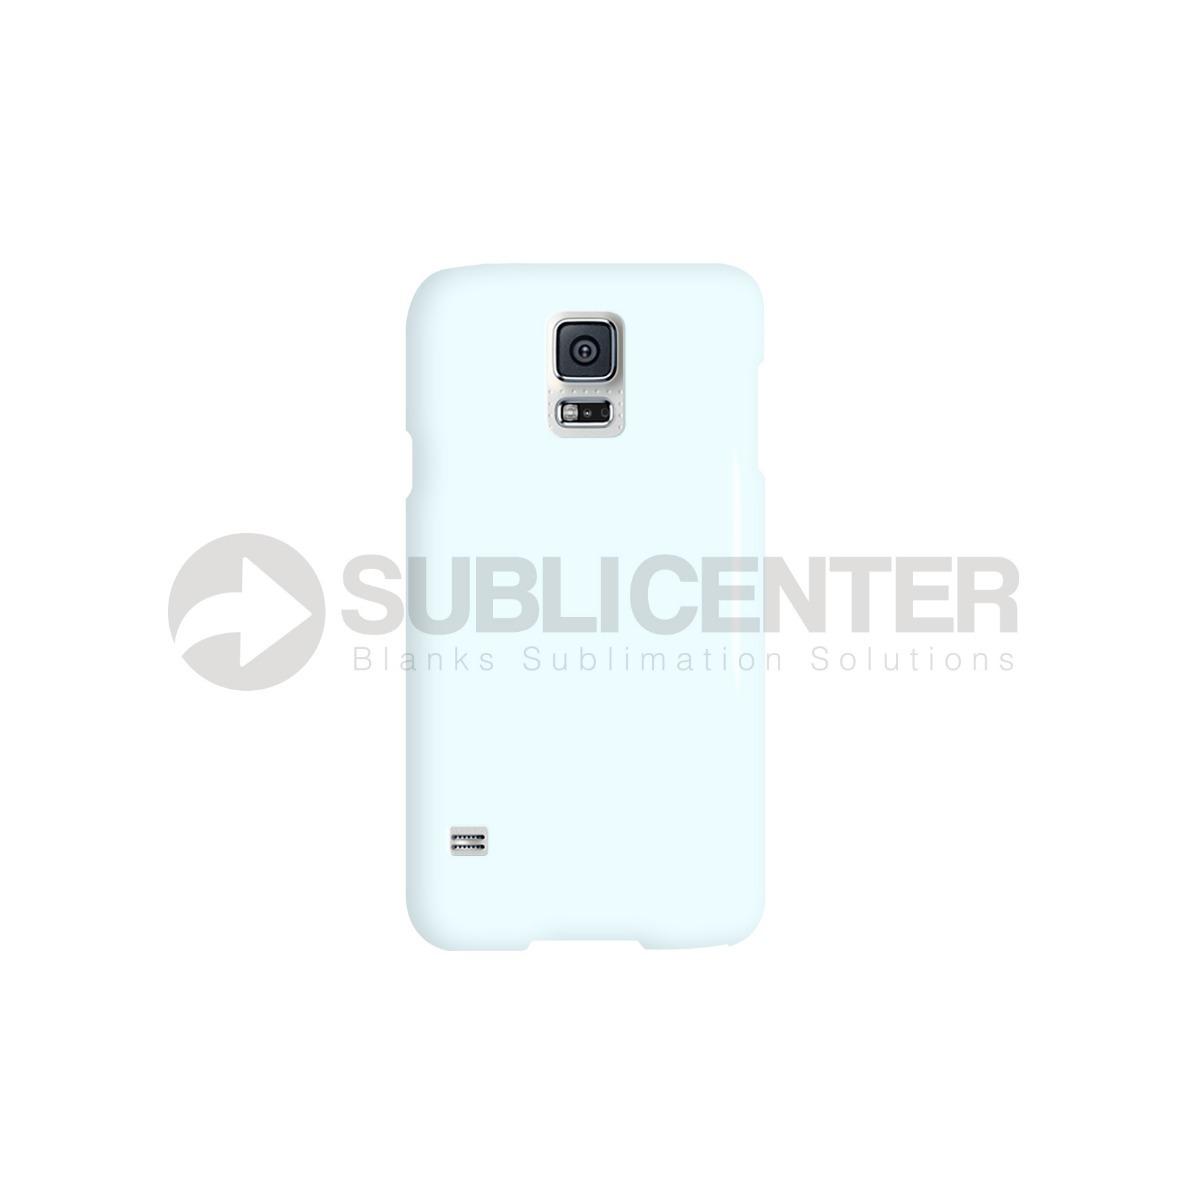 d2ee3e094f2 Fundas Para Celular 3d Sublimable Samsung S5 Mini - $ 55.00 en ...